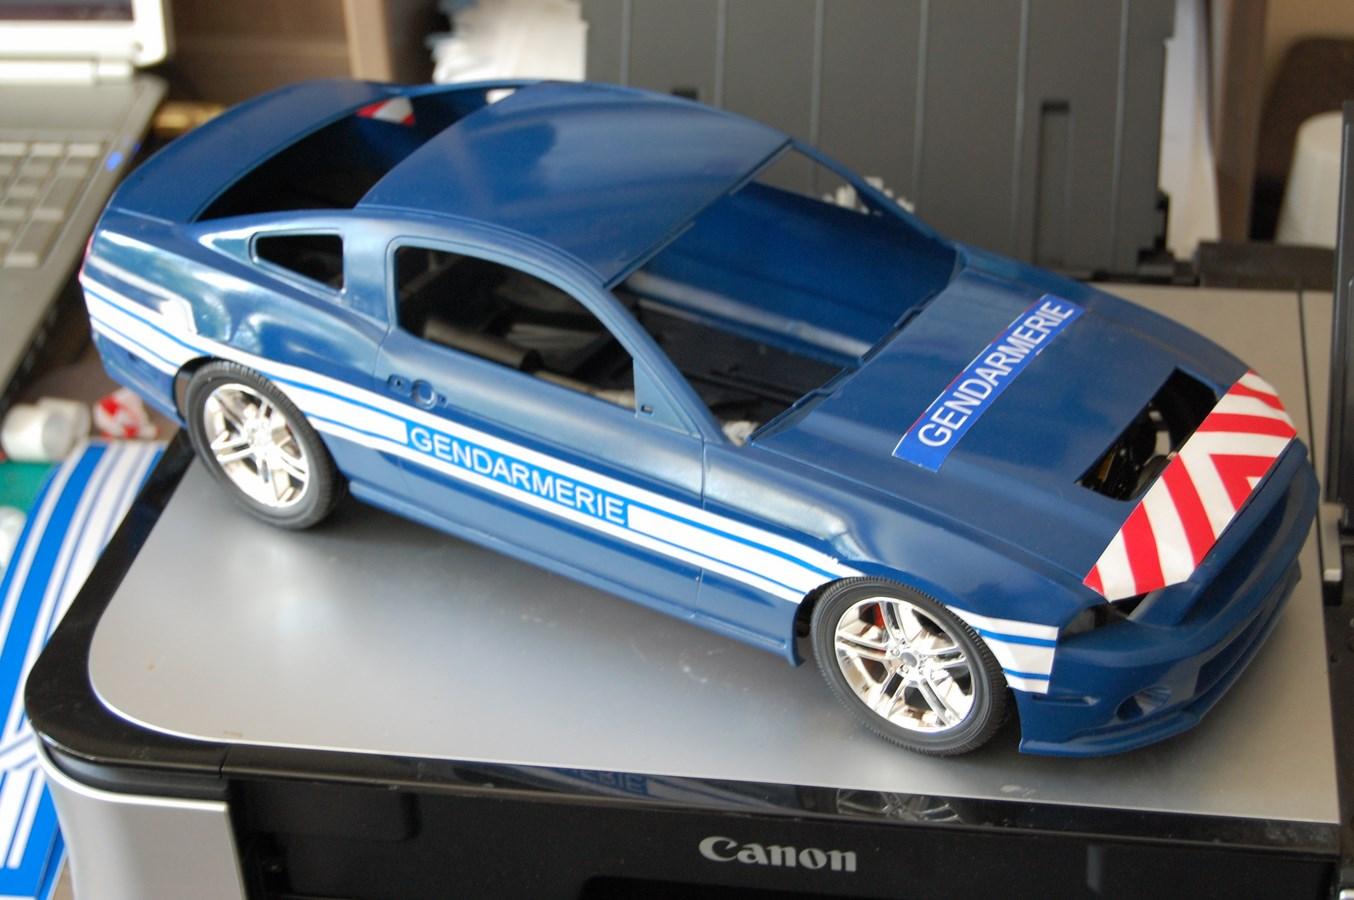 Shelby GT 500 version imaginaire Gendarmerie - Page 2 397016Mustag25Copier